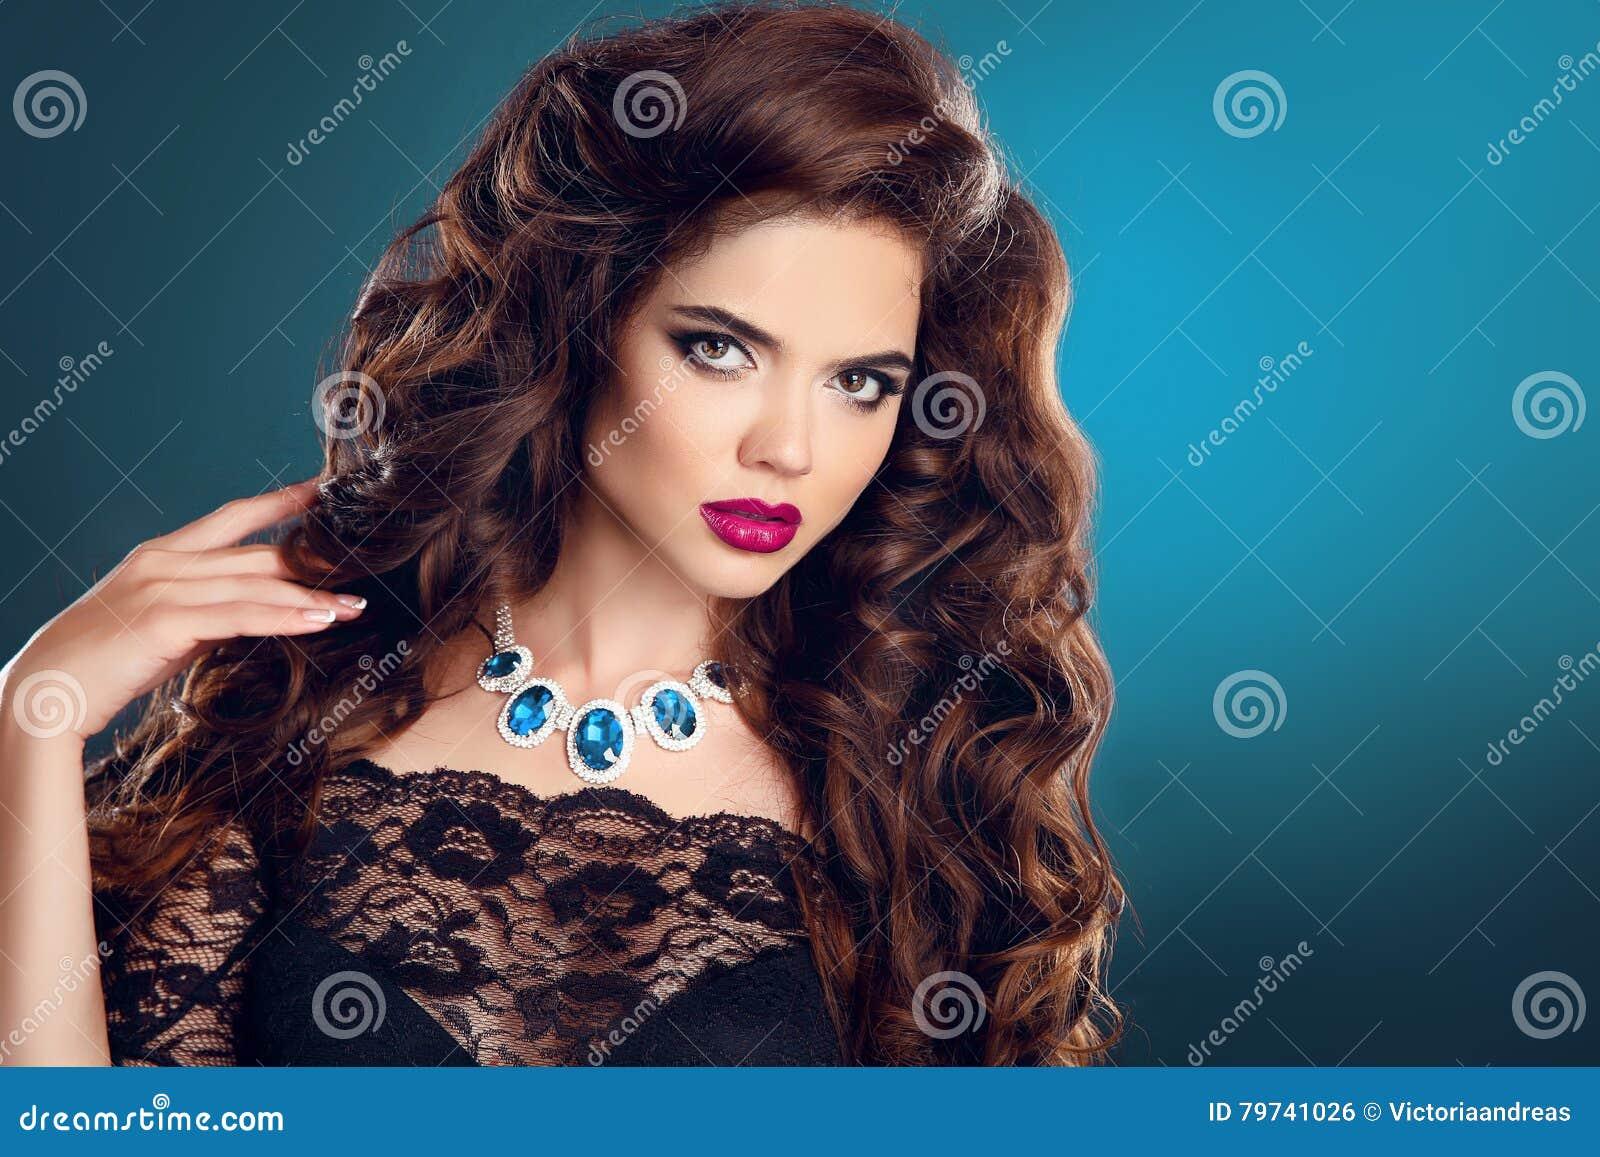 Maquillaje joyería hairstyle Modelo cabelludo oscuro de la ropa interior Muchacha hermosa con